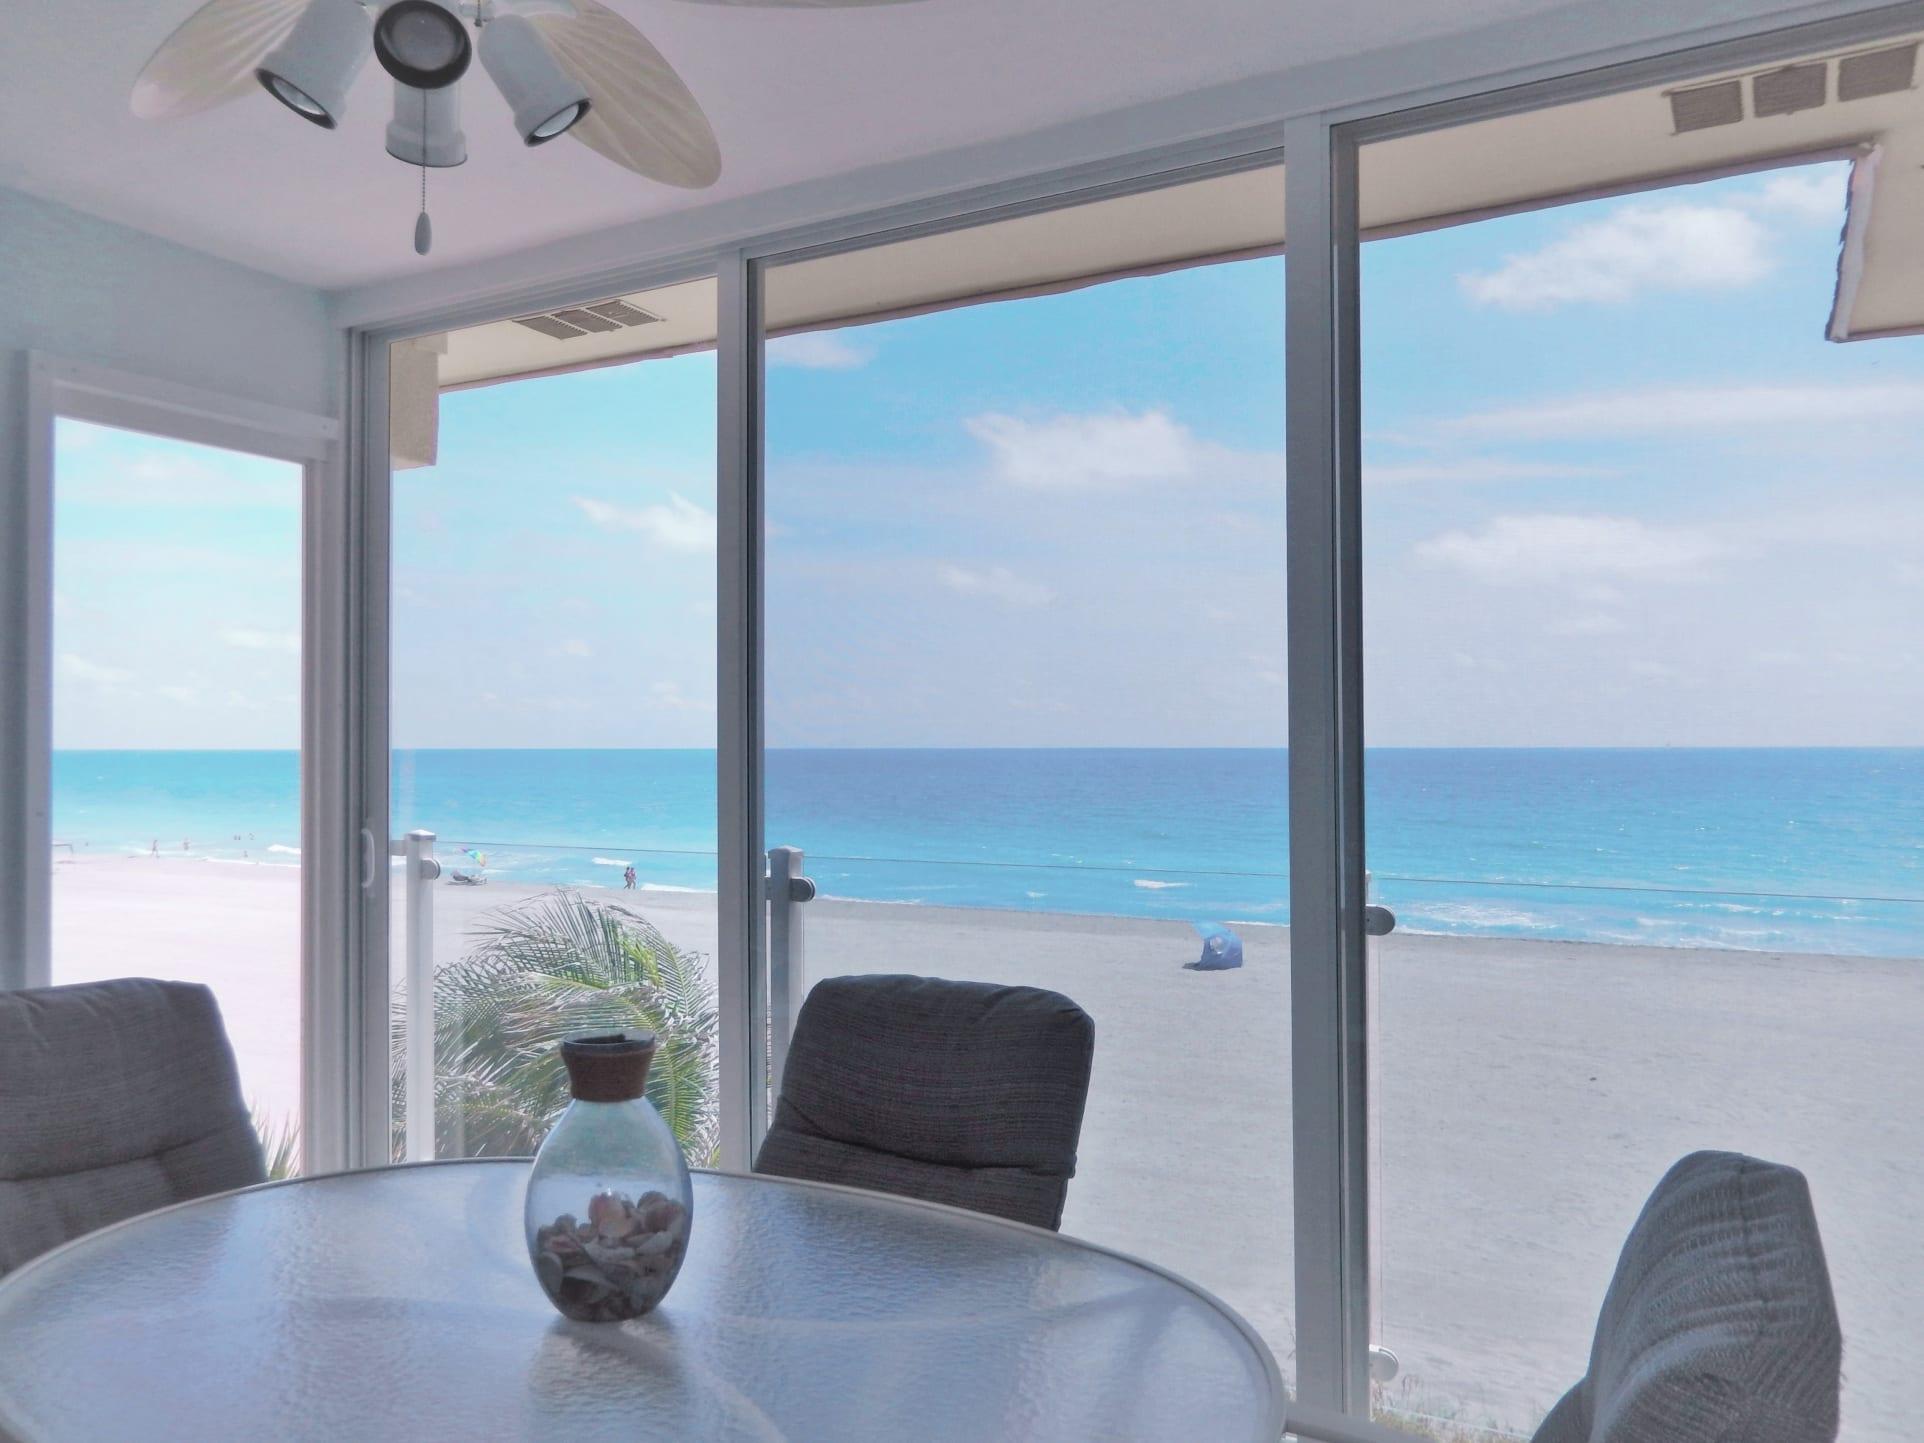 Direct Beachfront on Siesta Key, FL - Hawaii Chee